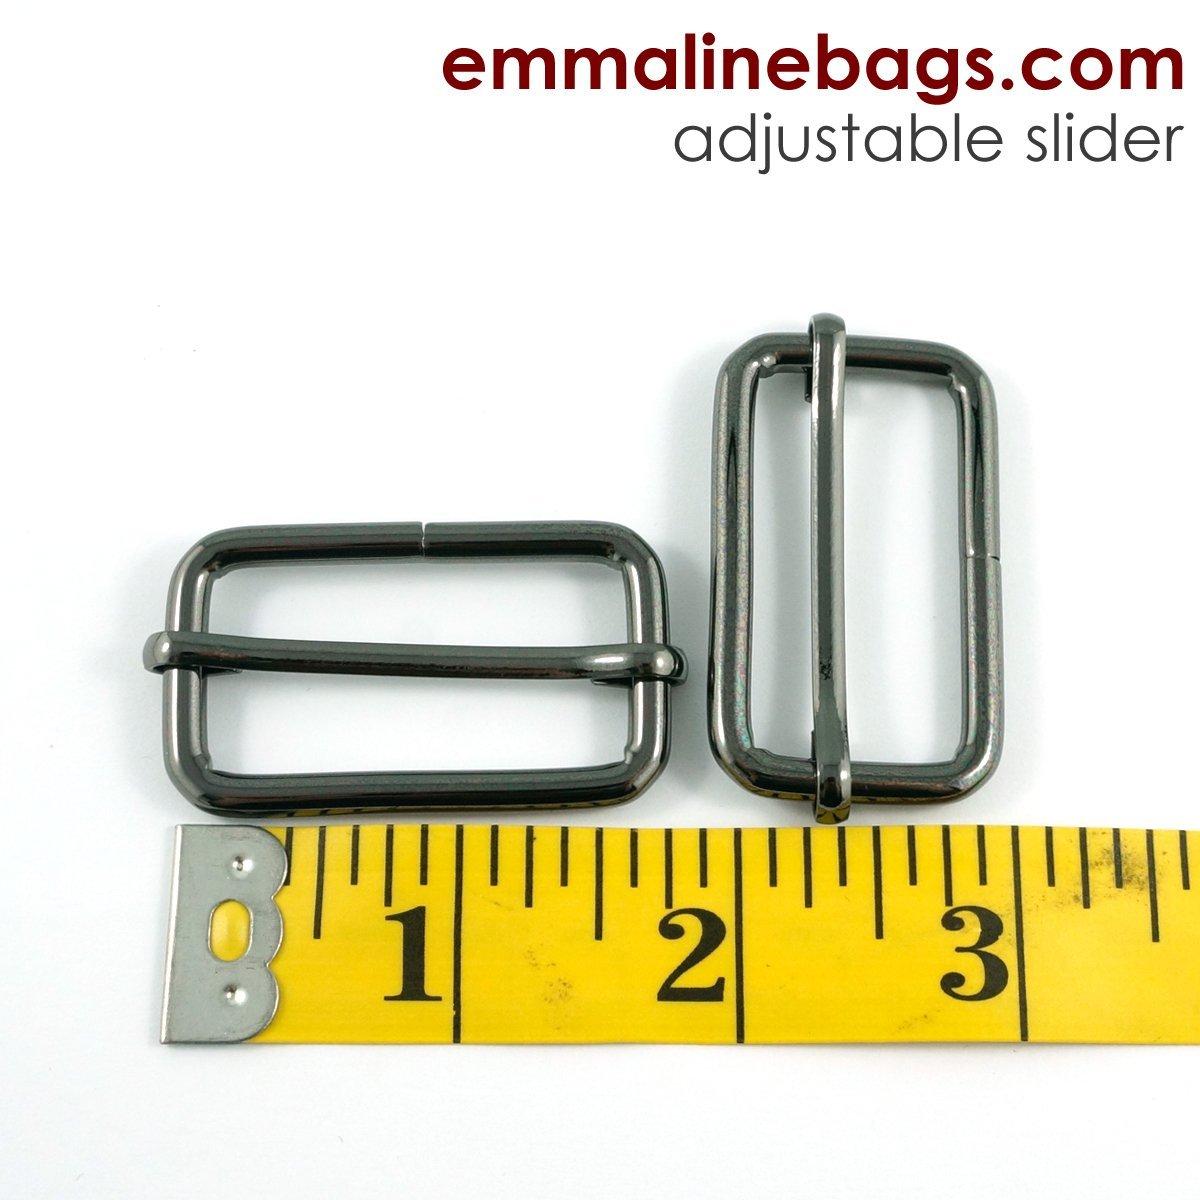 Adjustable Sliders (2 pack) 1 1/2 - Gunmetal